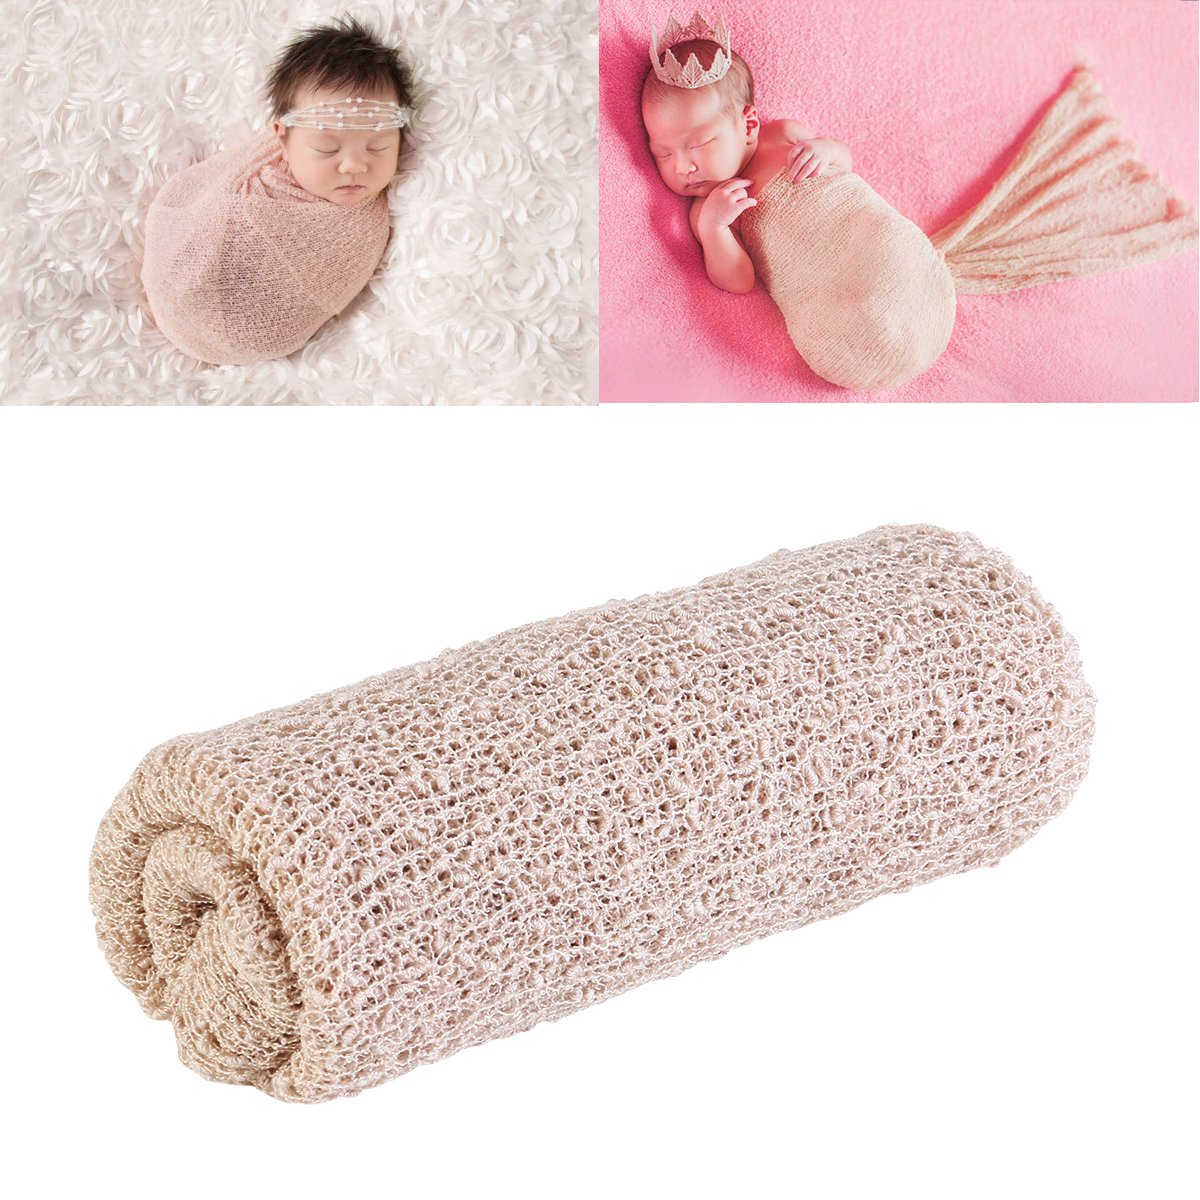 OULII Lange Wellen Sie Wrap, DIY neugeborenes Baby Fotografie Wrap-Babyfoto Props (Beige)